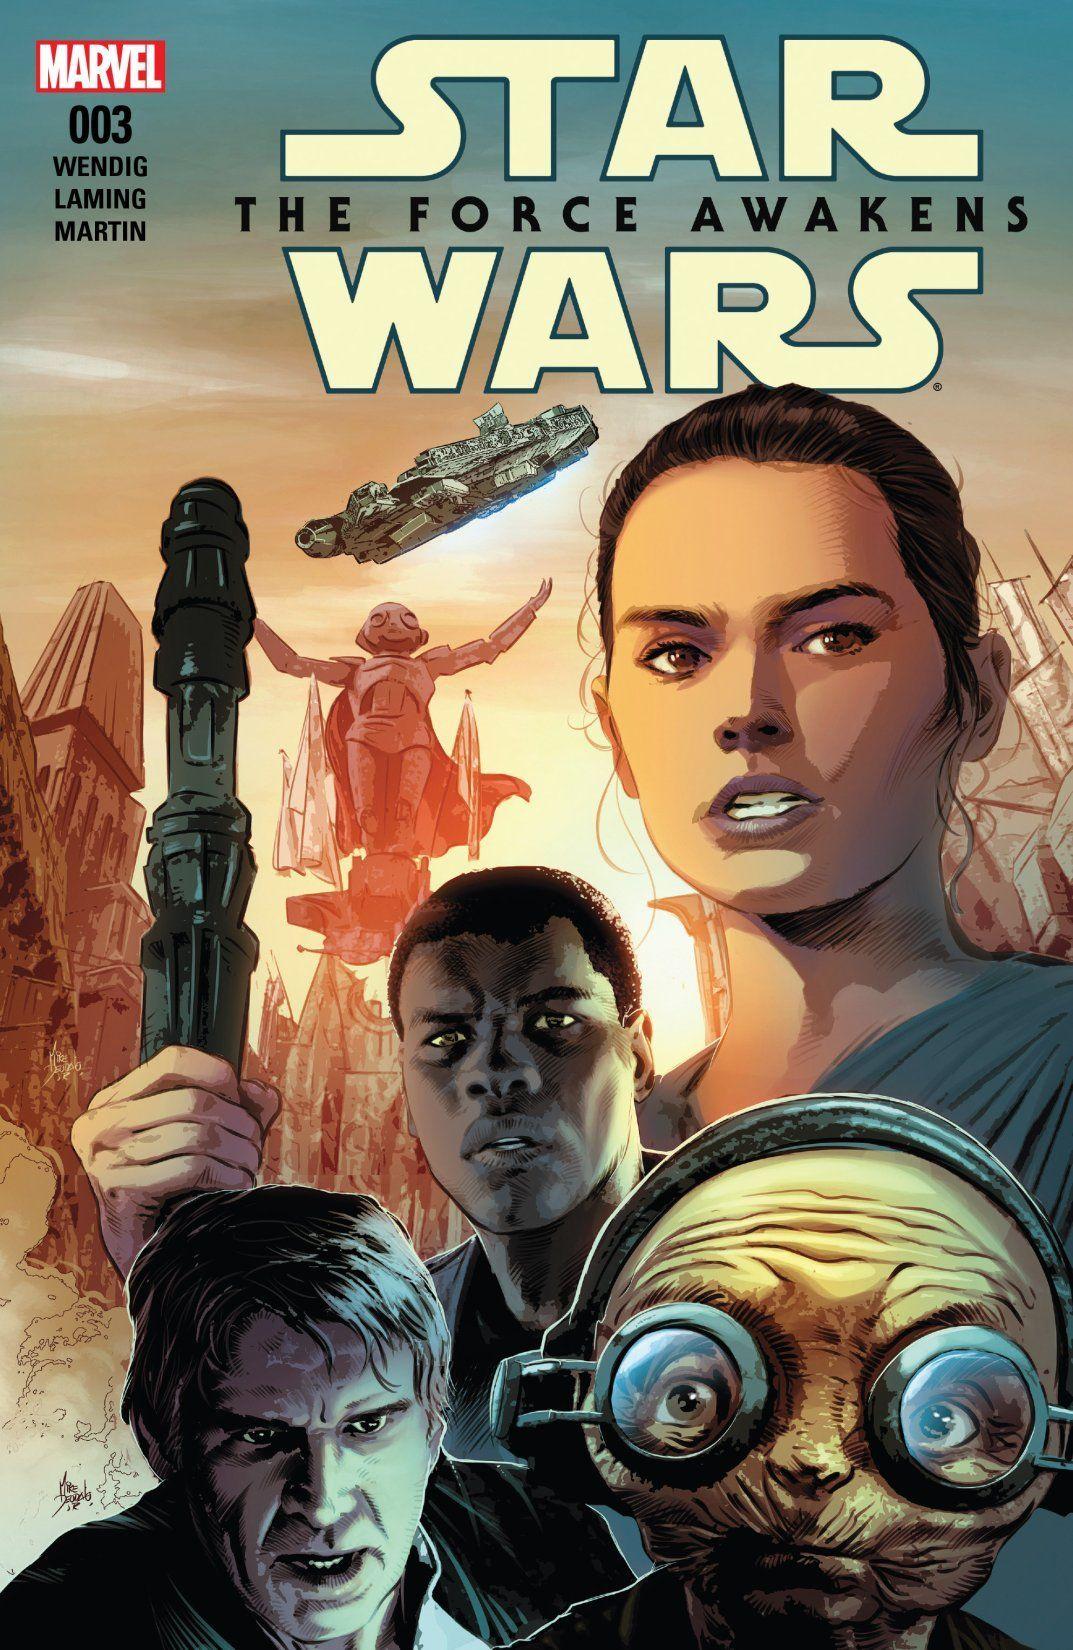 STAR WARS FORCE AWAKENS ADAPTATION #3 OF 6